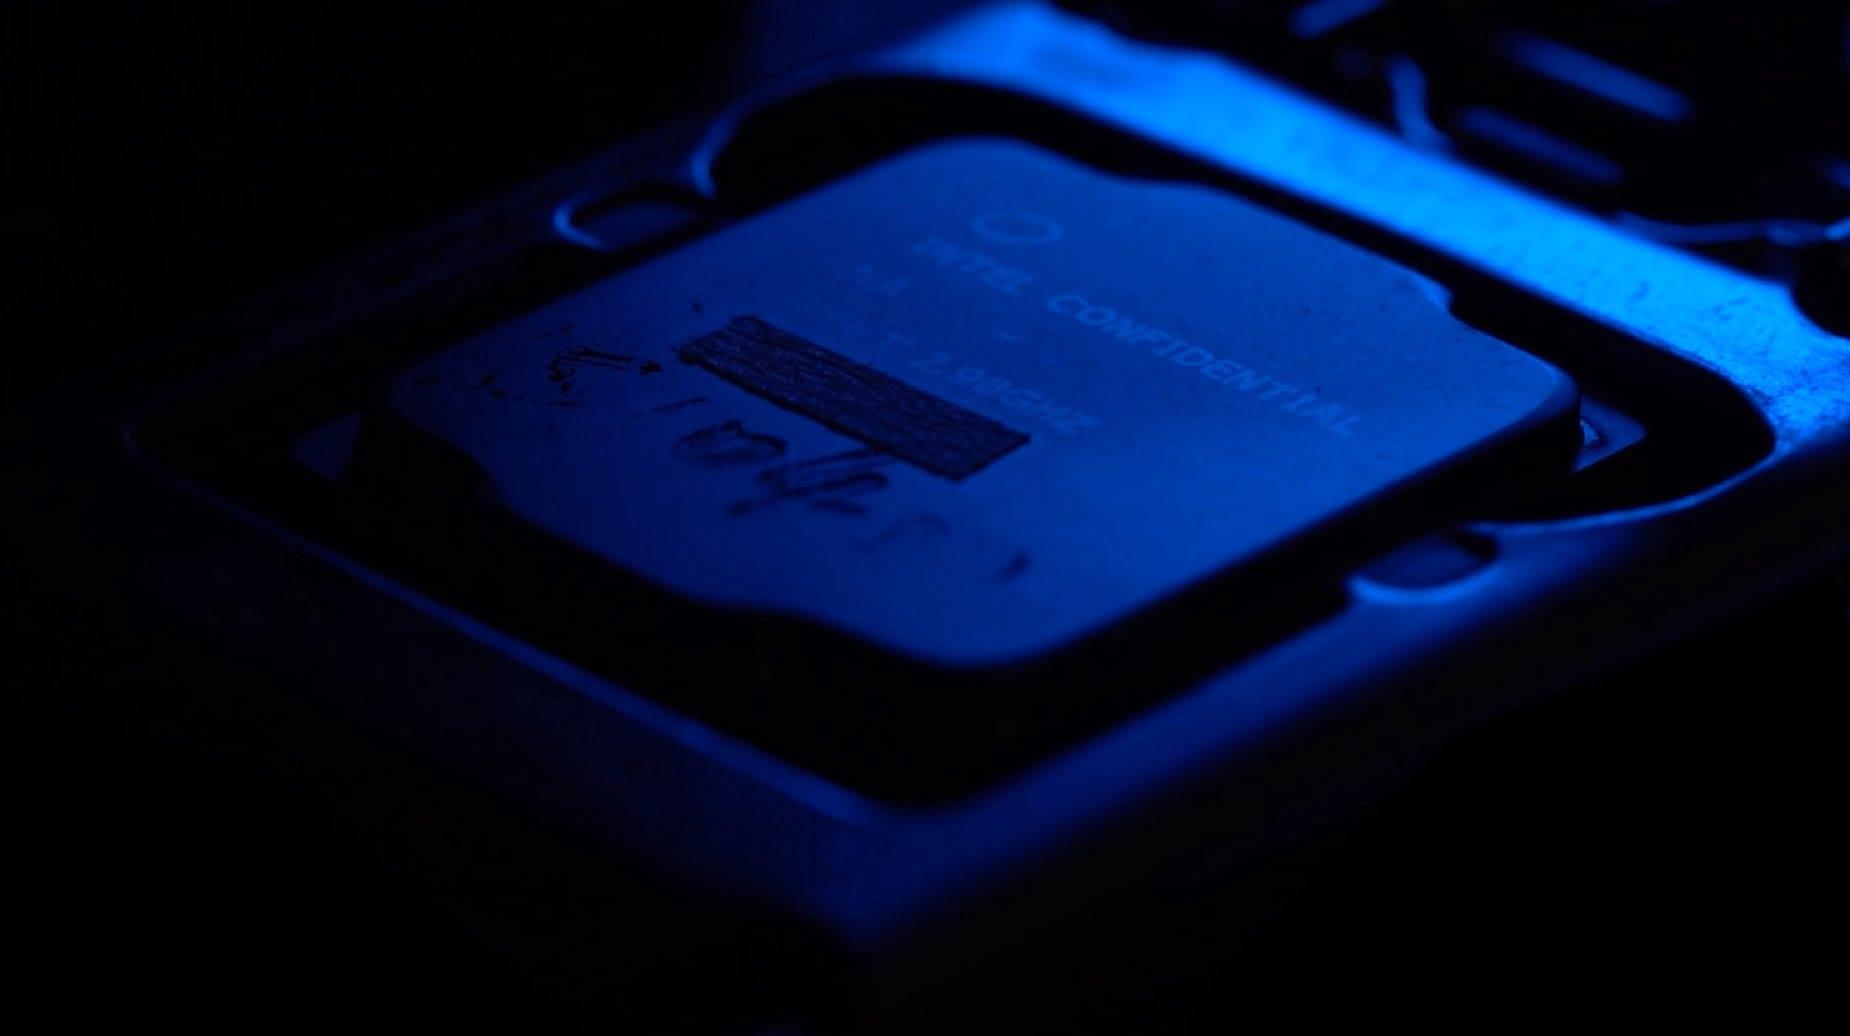 Первые тесты 12-поточного процессора Intel Core i5-10400 плюс сравнение с Core i5-9400F и Core i7-9700F